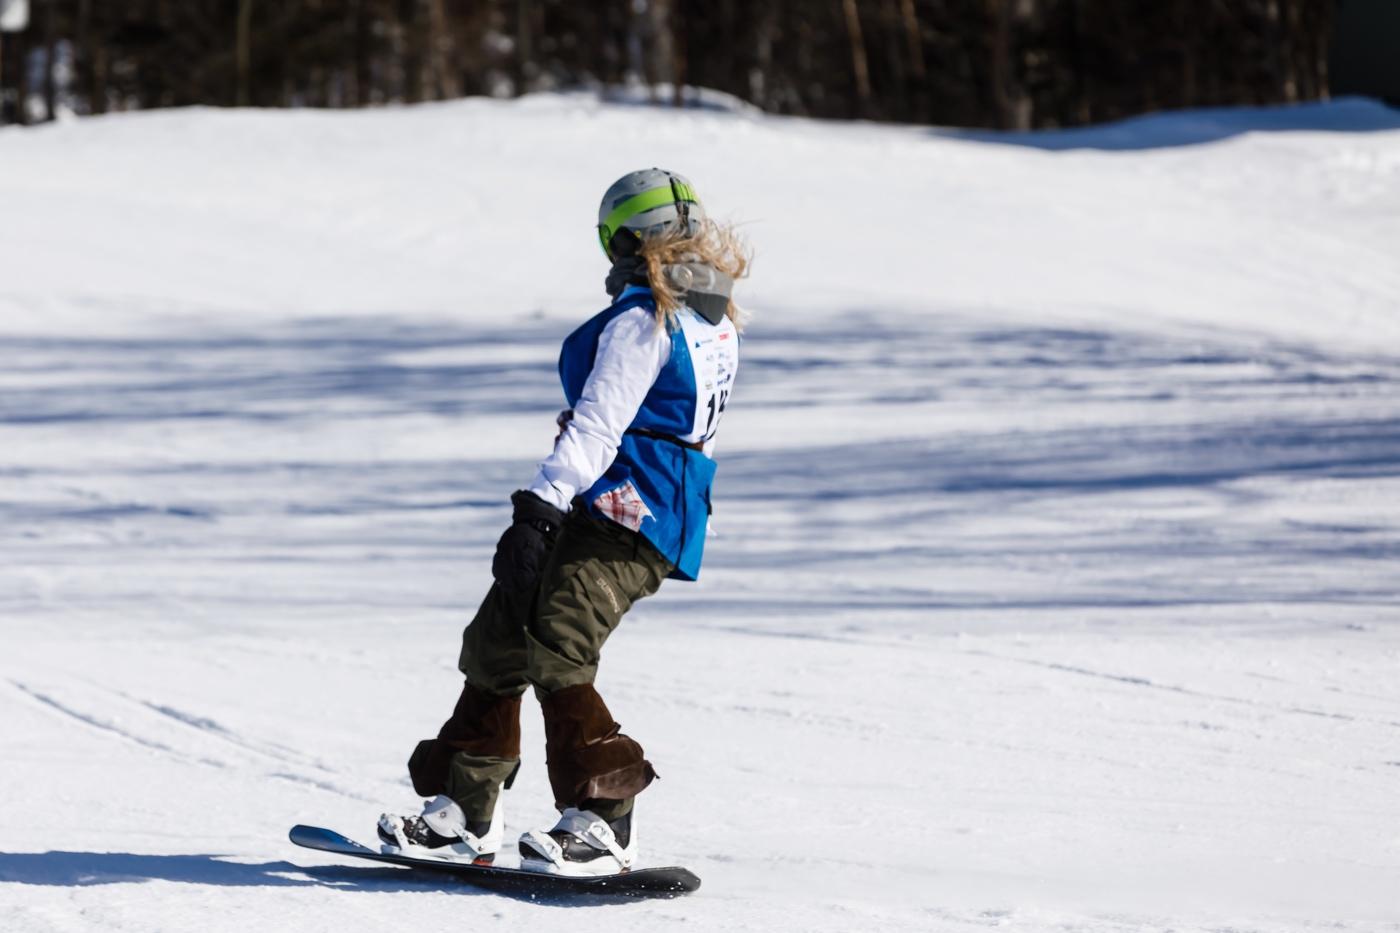 WinterKids Downhill 24 2021 SDP 3244